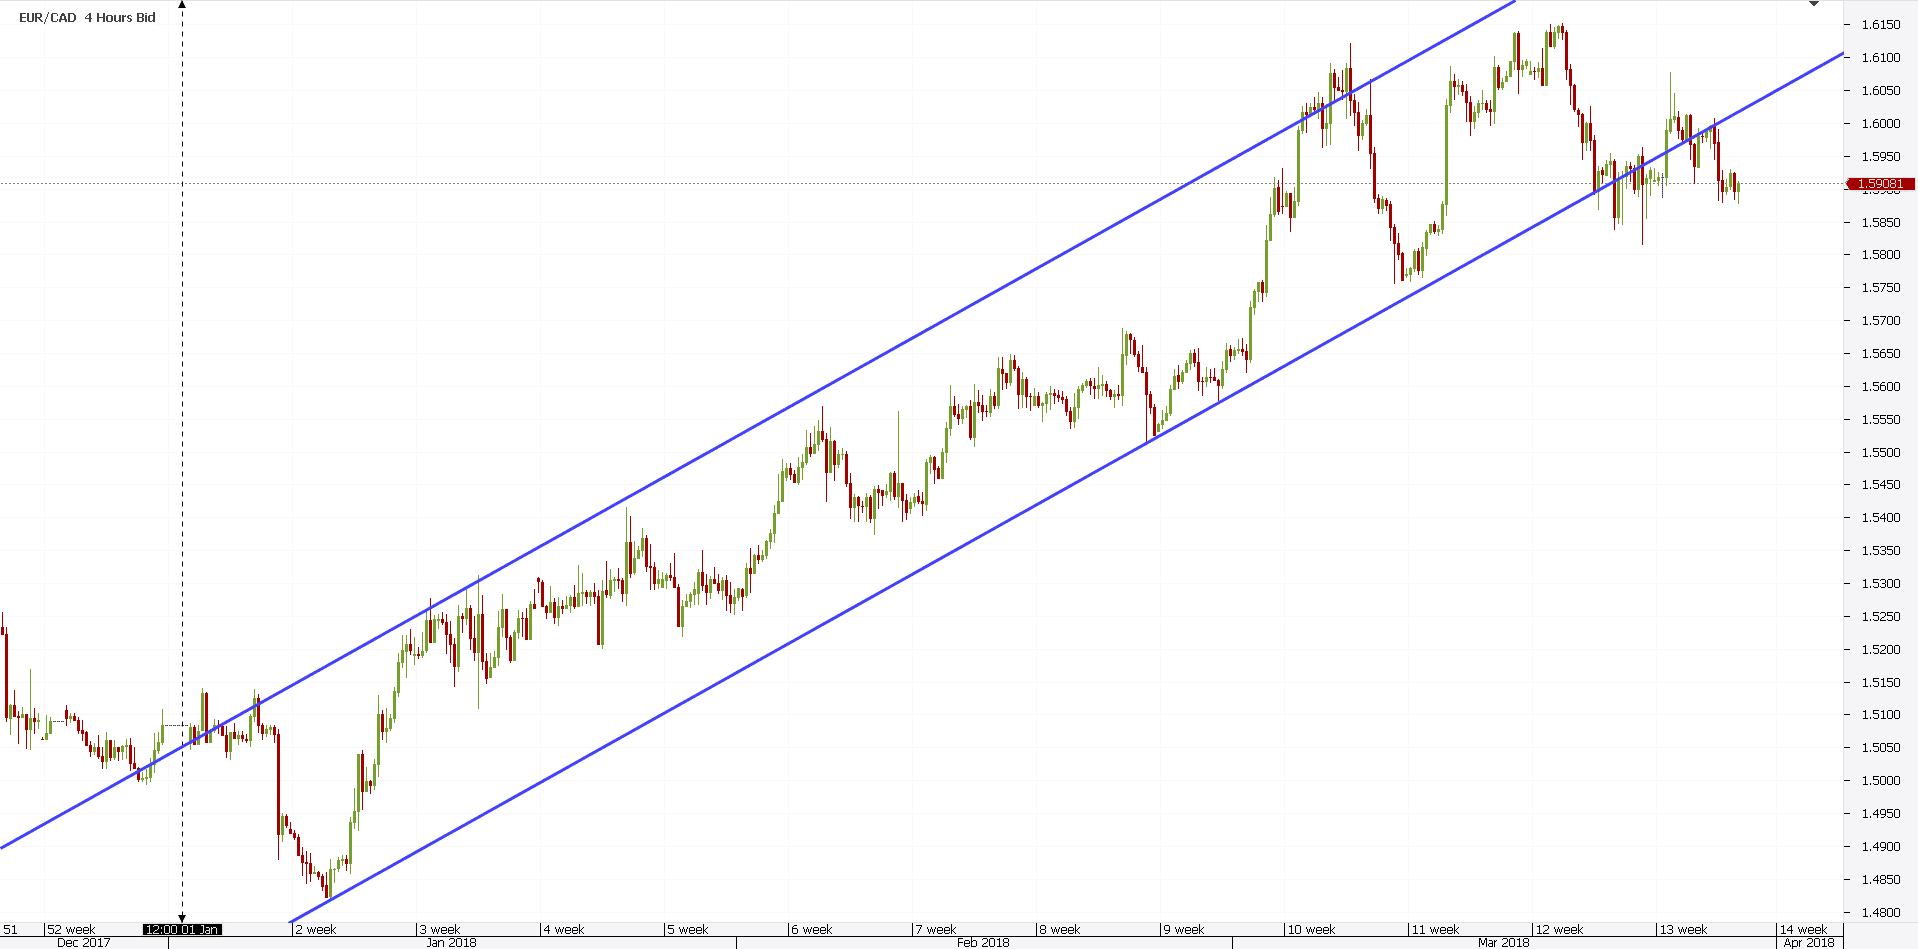 Trading on Stock Market